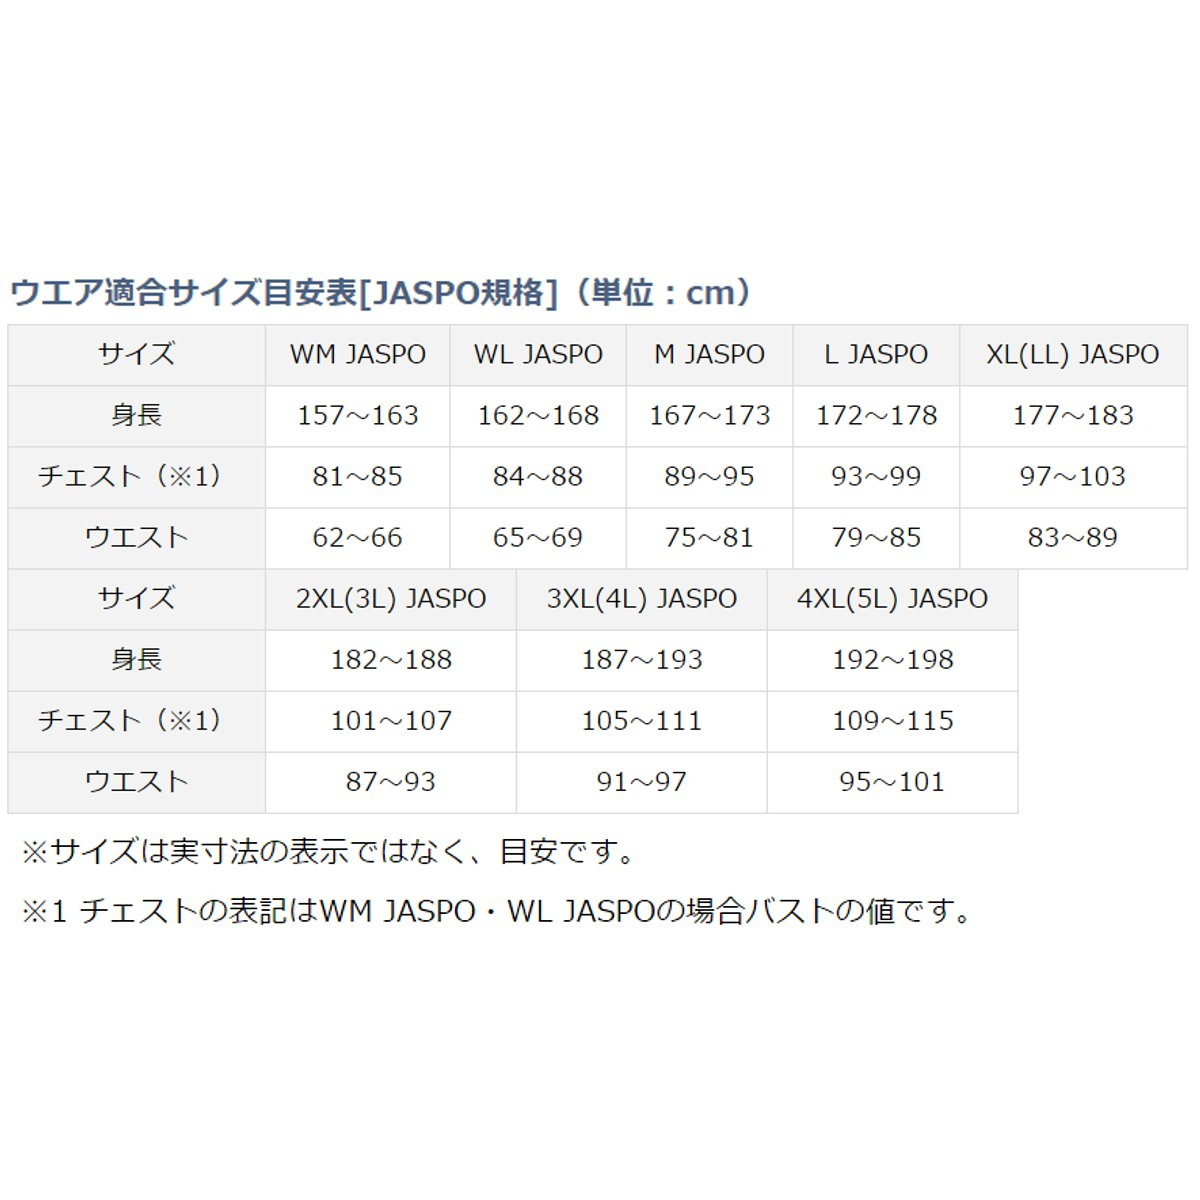 Daiwa (Daiwa) rain max pocketable rain jacket DR-3207J XL green duck